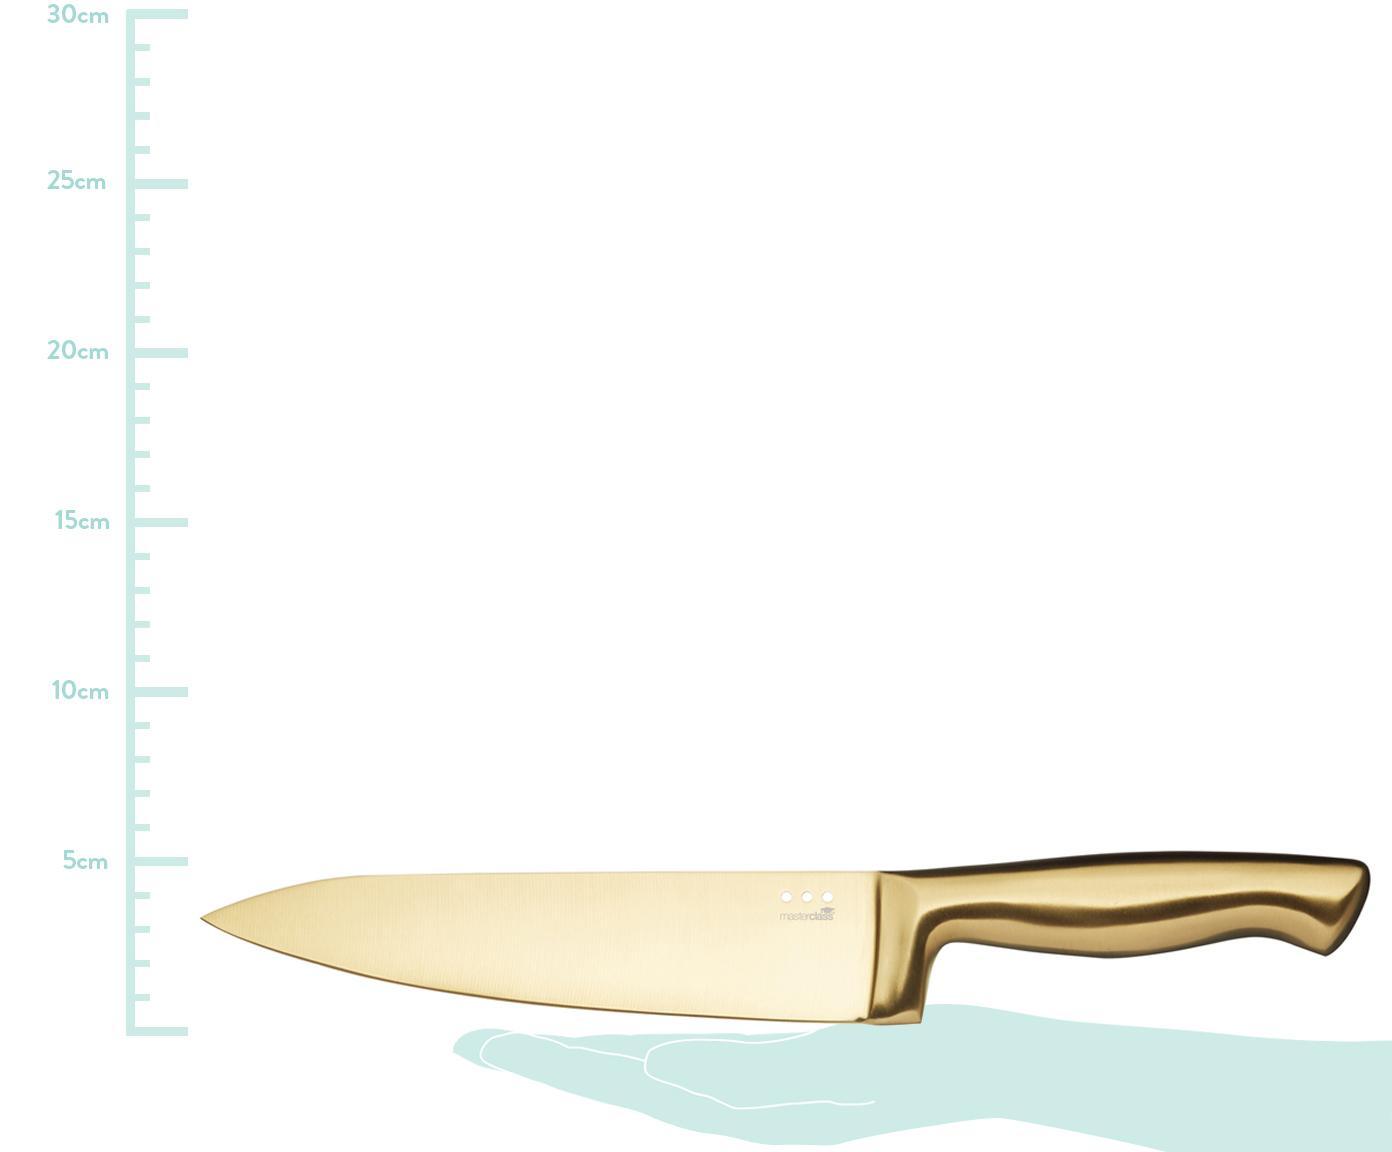 Messer-Set Master Class, 6-tlg., Stahl, beschichtet, Schwarz, Messingfarben, Sondergrößen